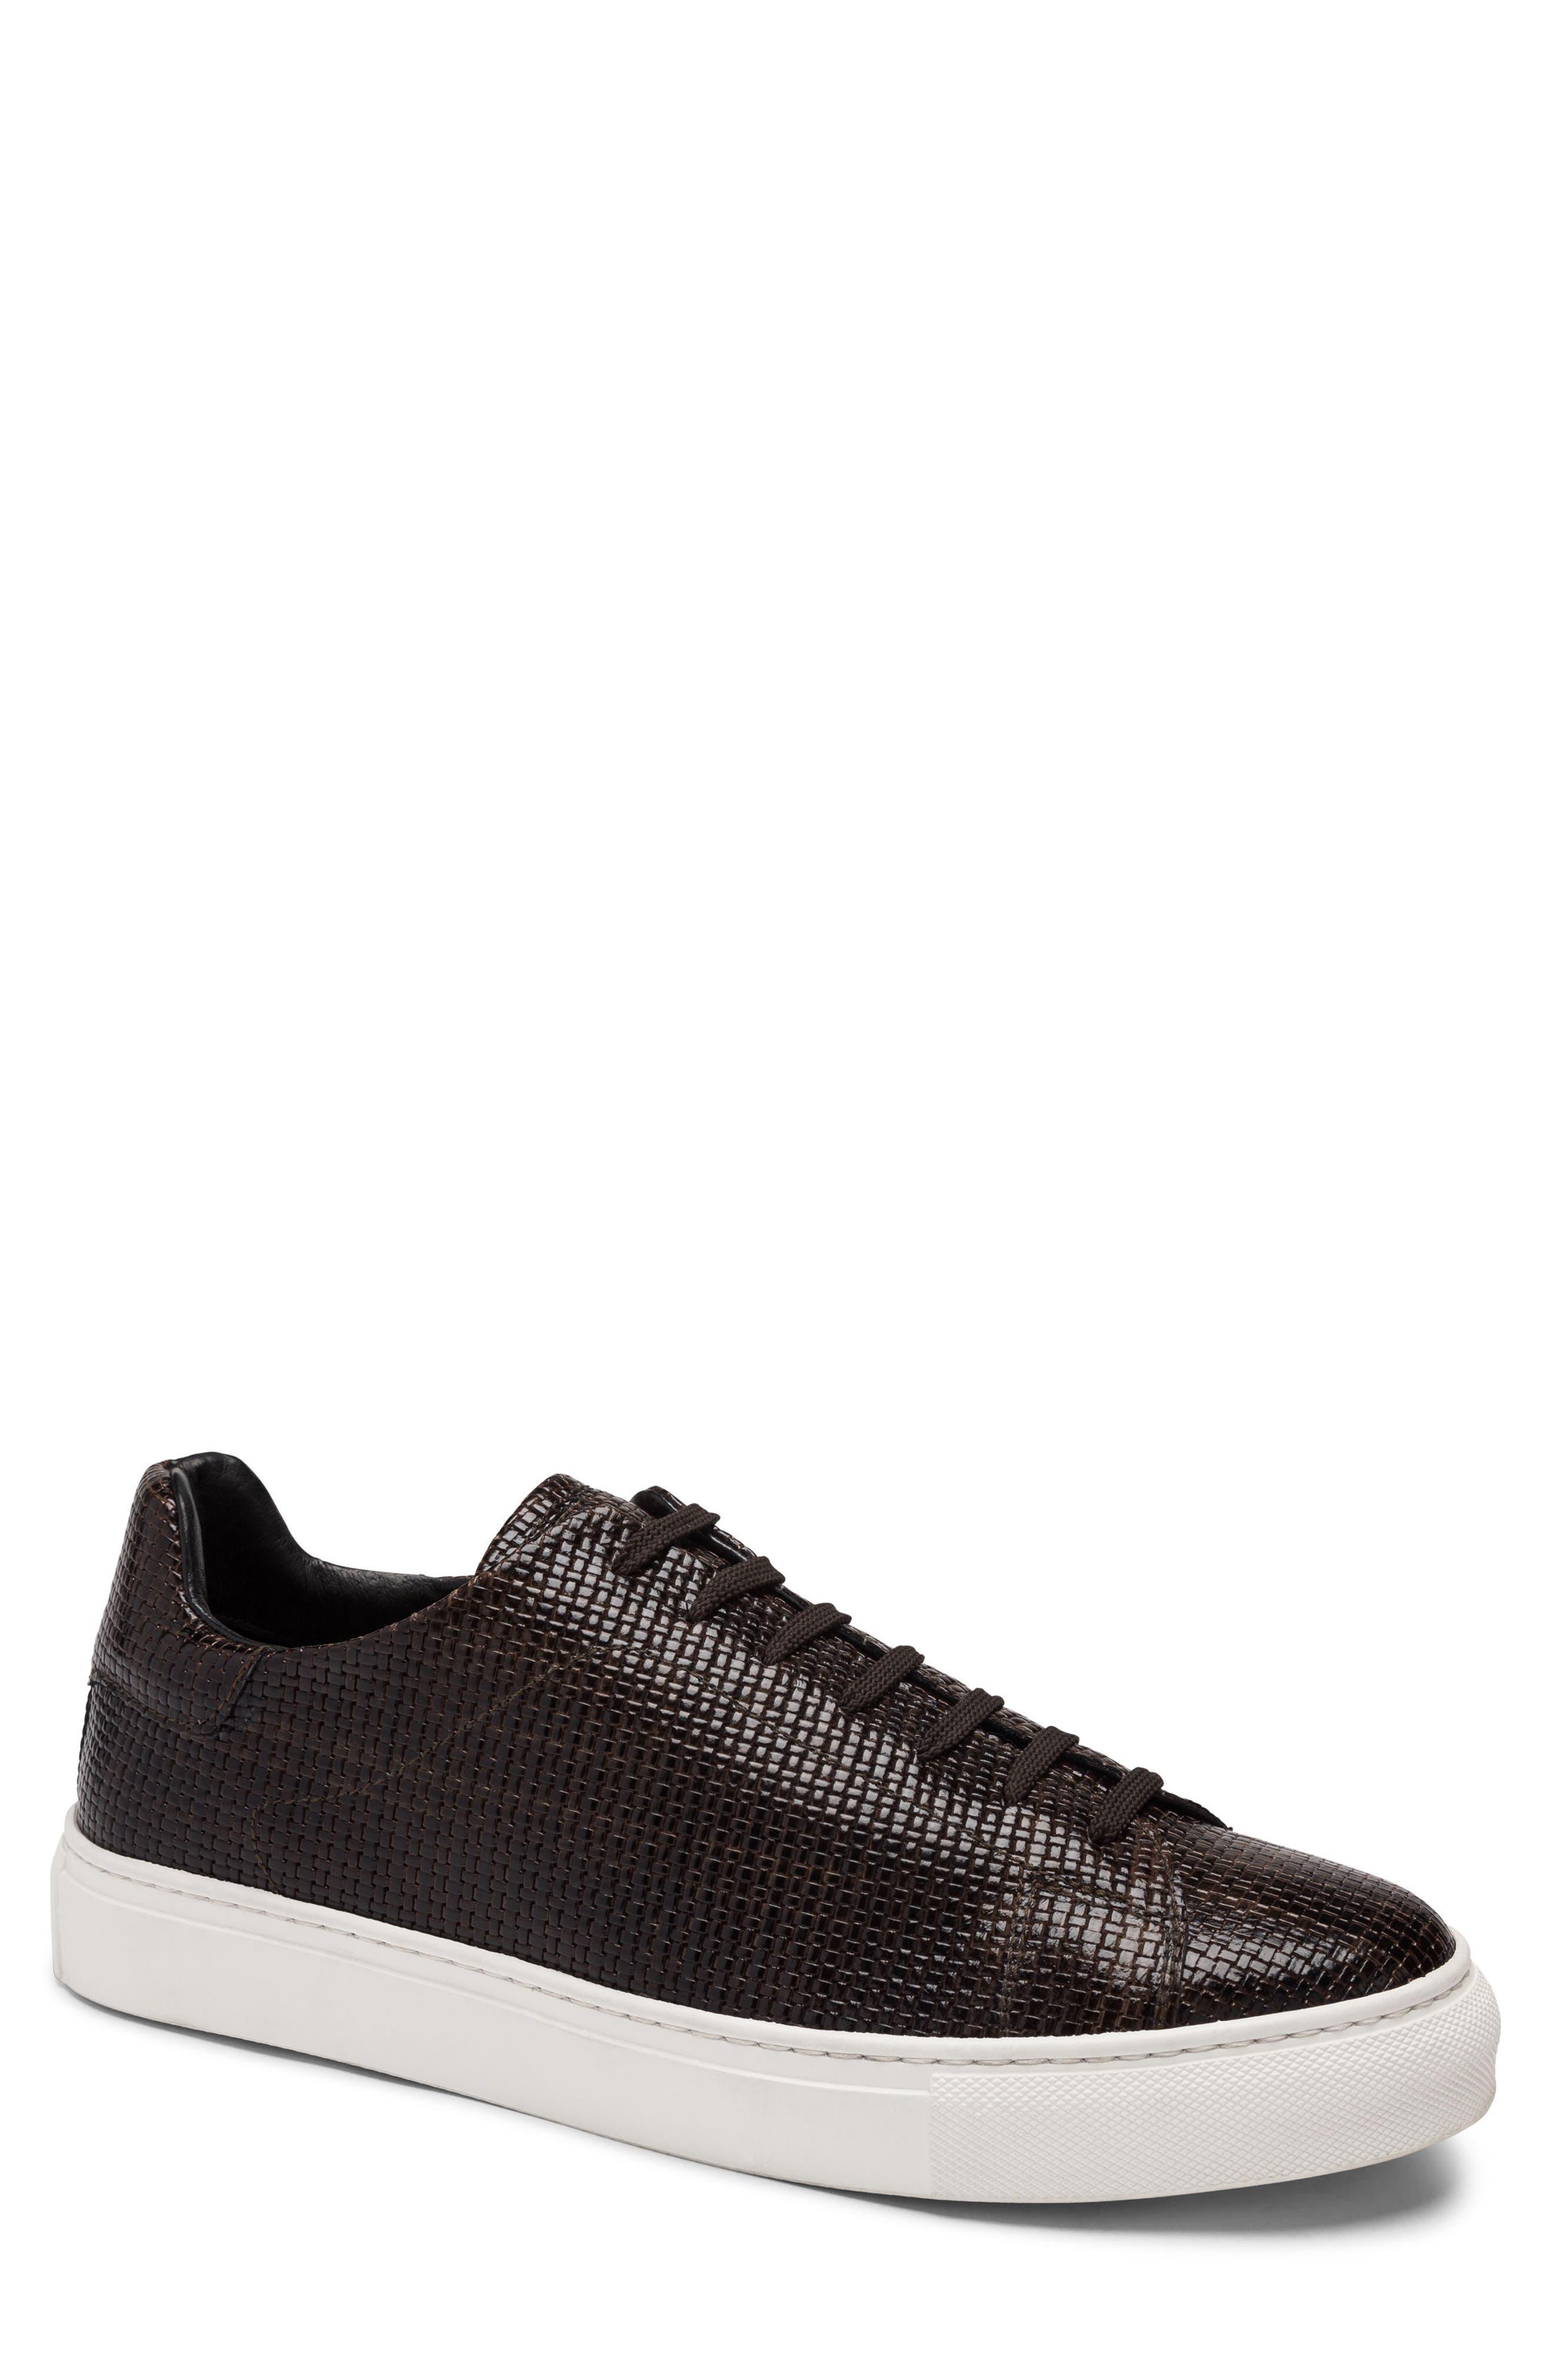 Wimbledon Sneaker,                         Main,                         color, TESTA DI MORO